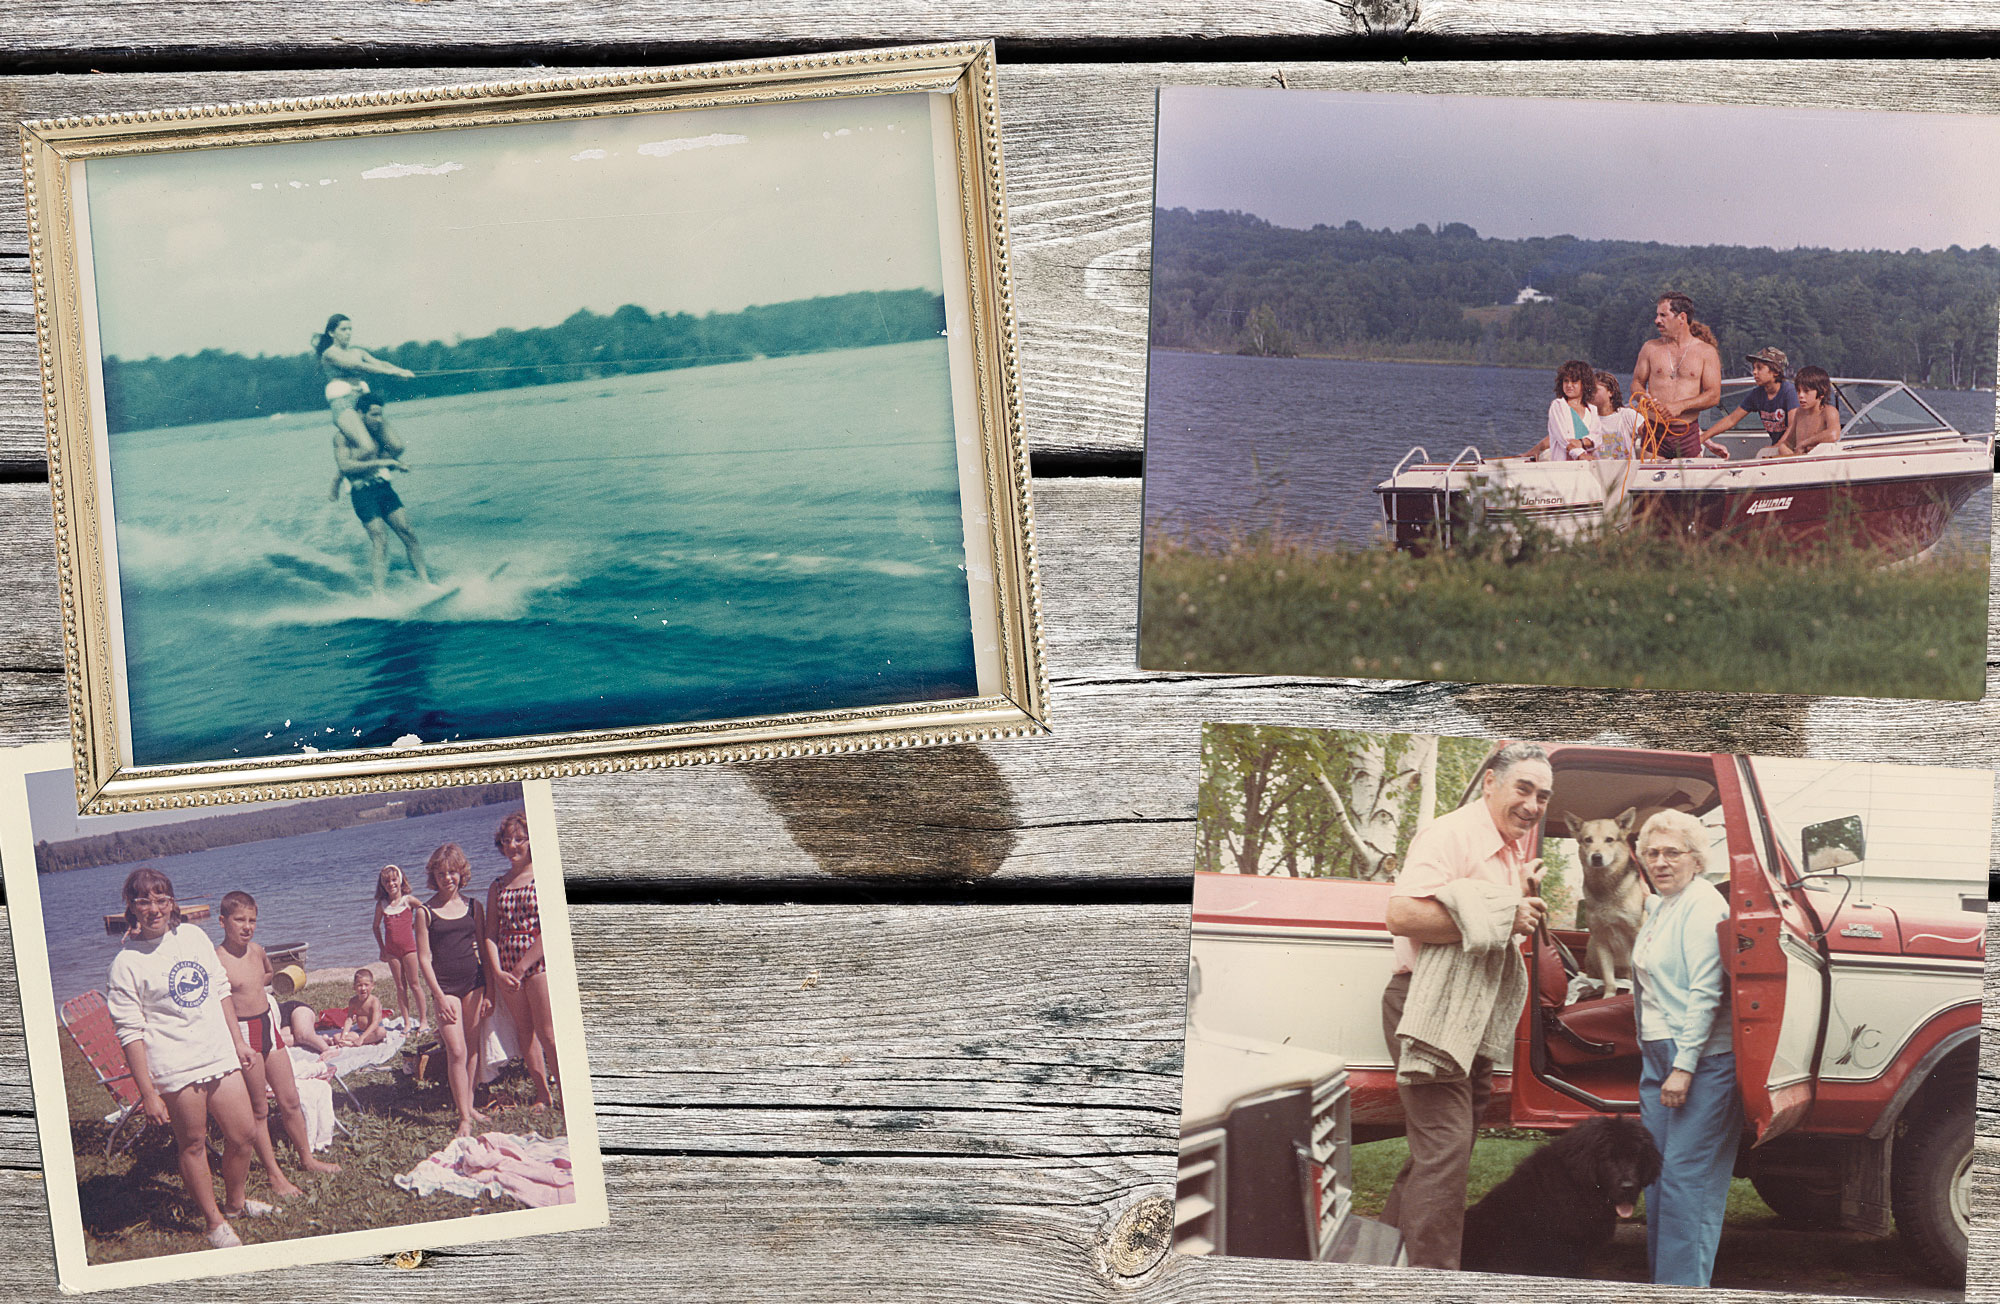 Endless Vanished Days, McGrath Pond, Maine